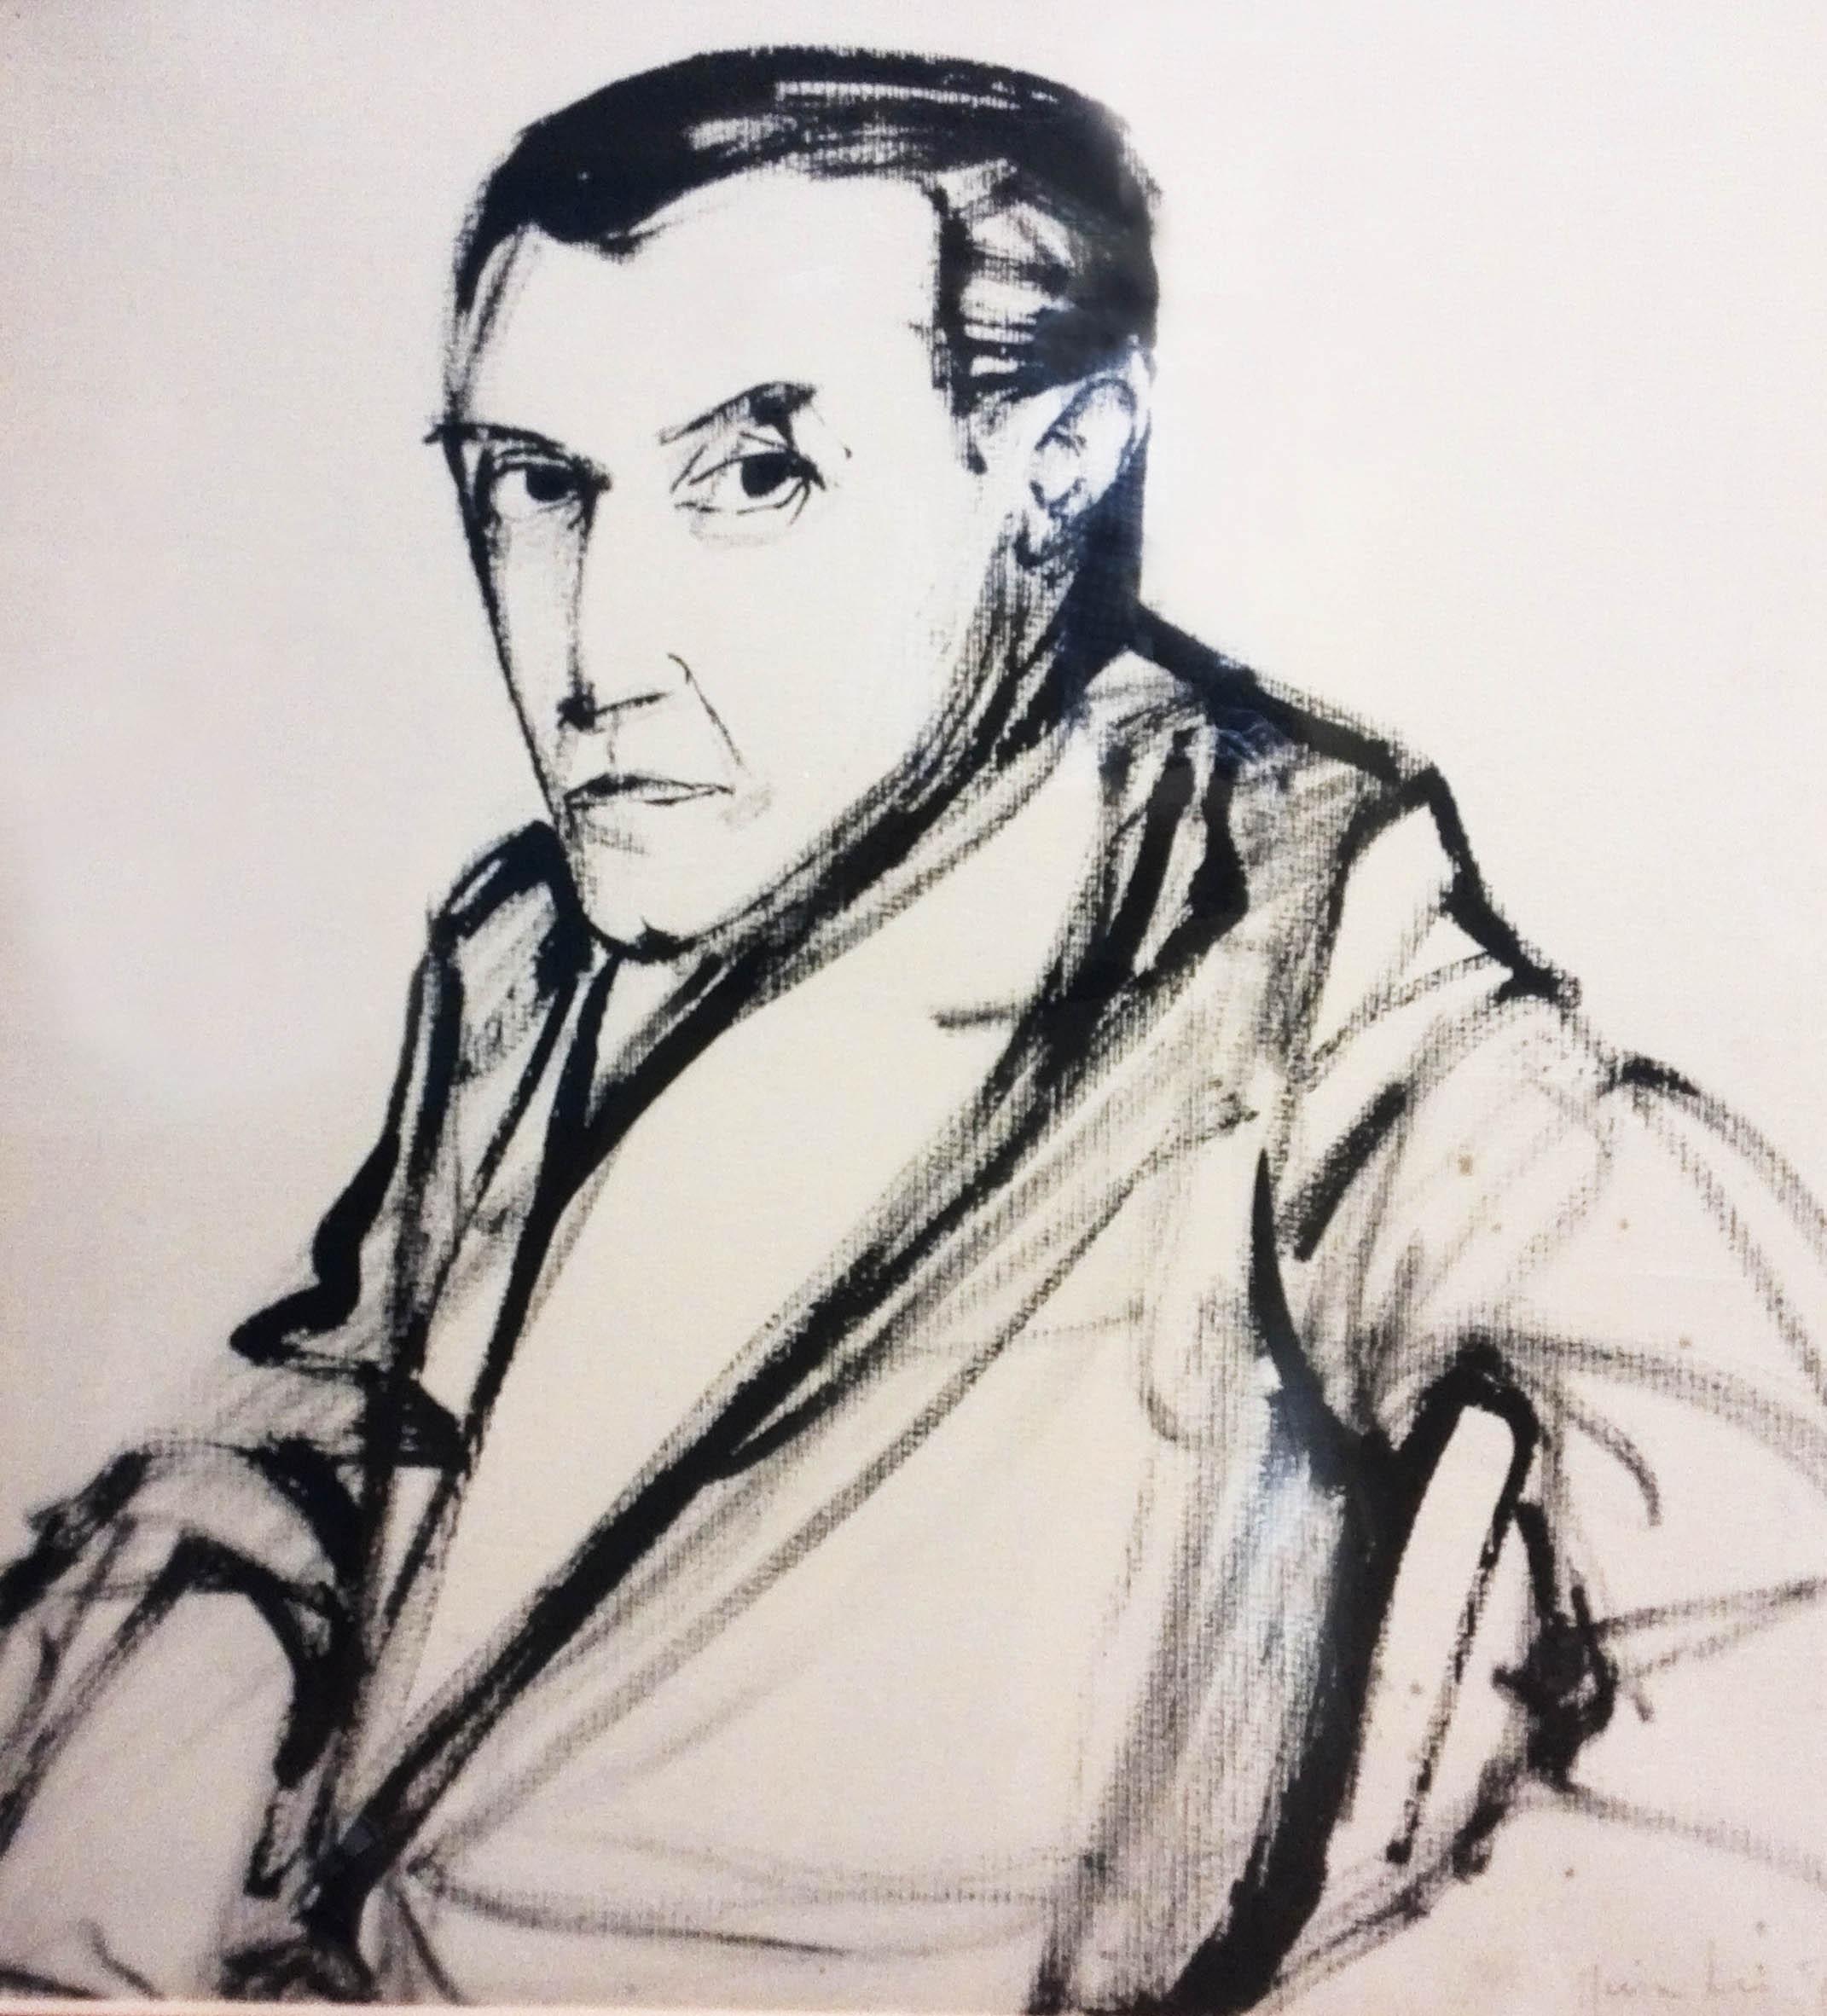 Salvatore Cambosu by Maria Lai, 1952